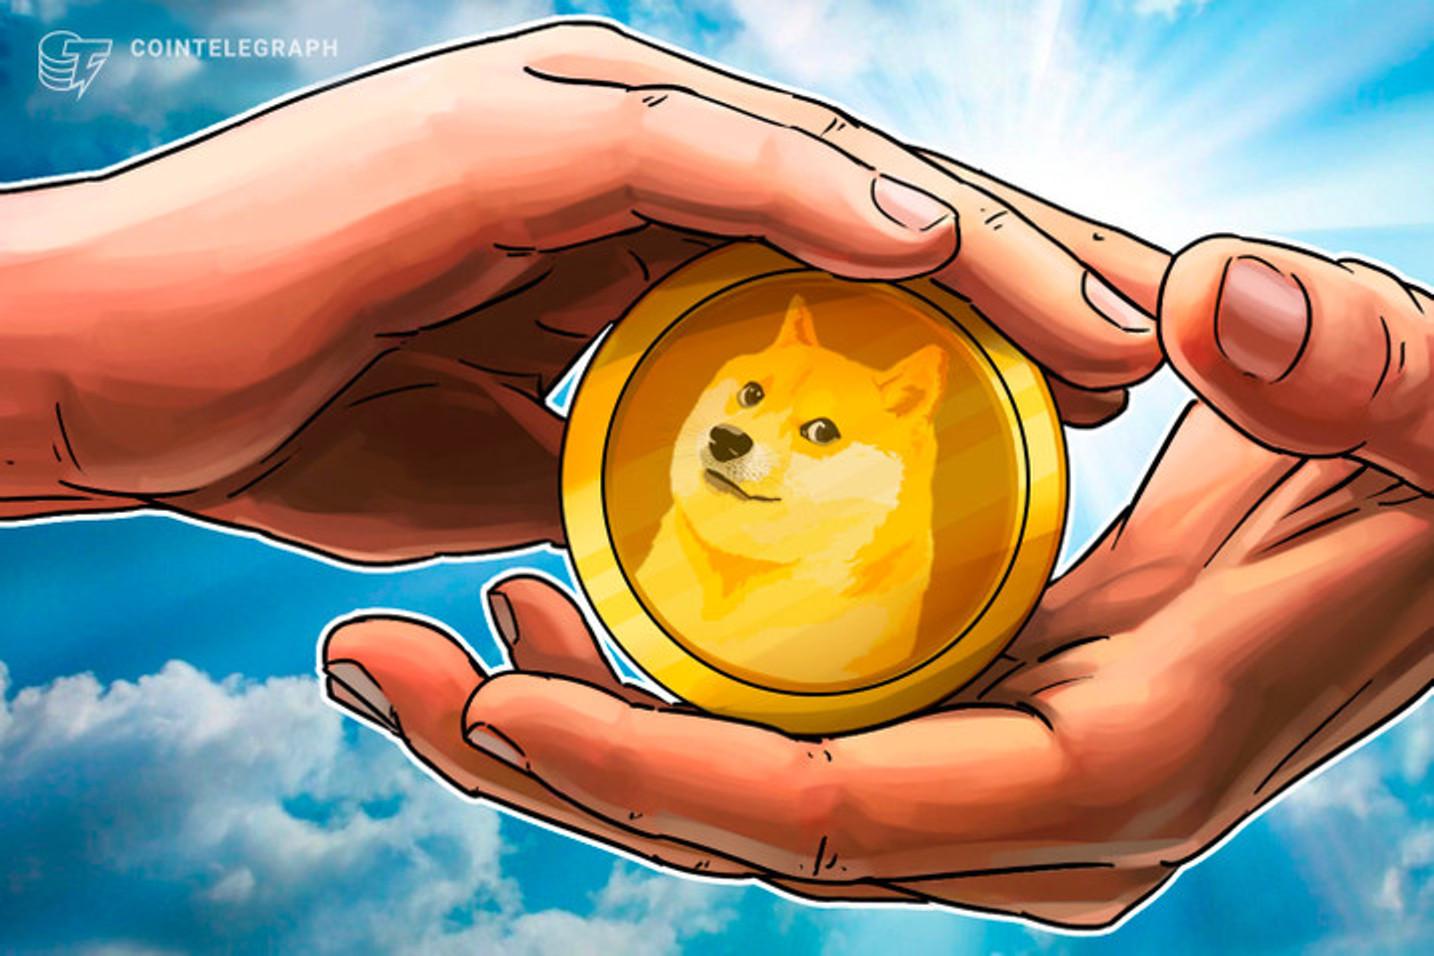 Dogecoin brasileira: deputado federal quer cachorro Caramelo ao invés de Lobo-guará na nota de R$ 200